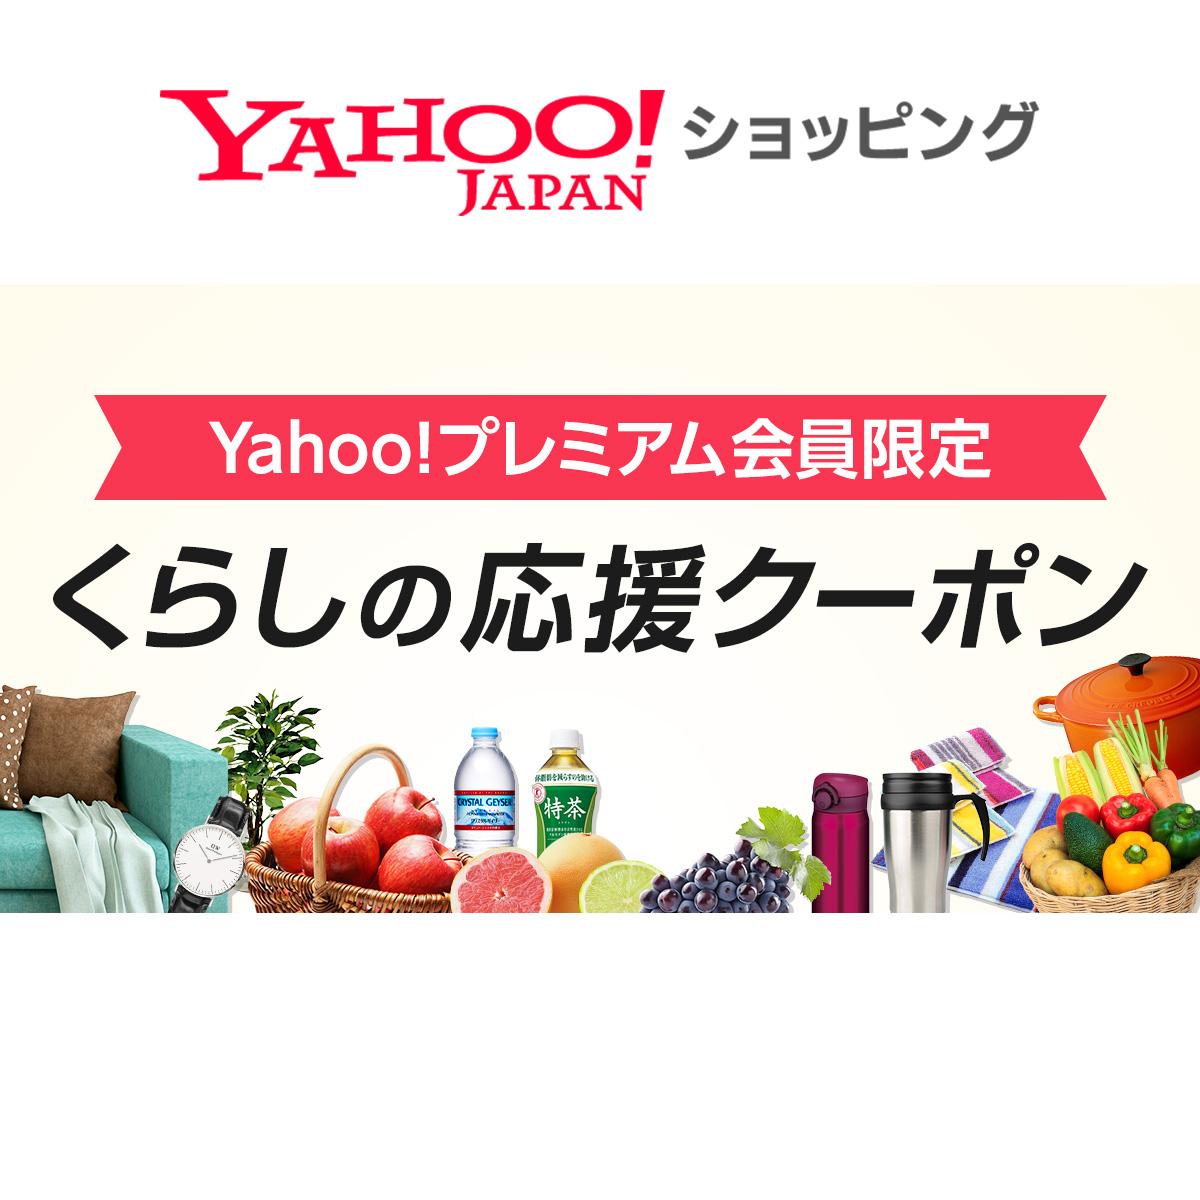 263e3a626724 とってもお得! くらしの応援クーポン - Yahoo!ショッピング